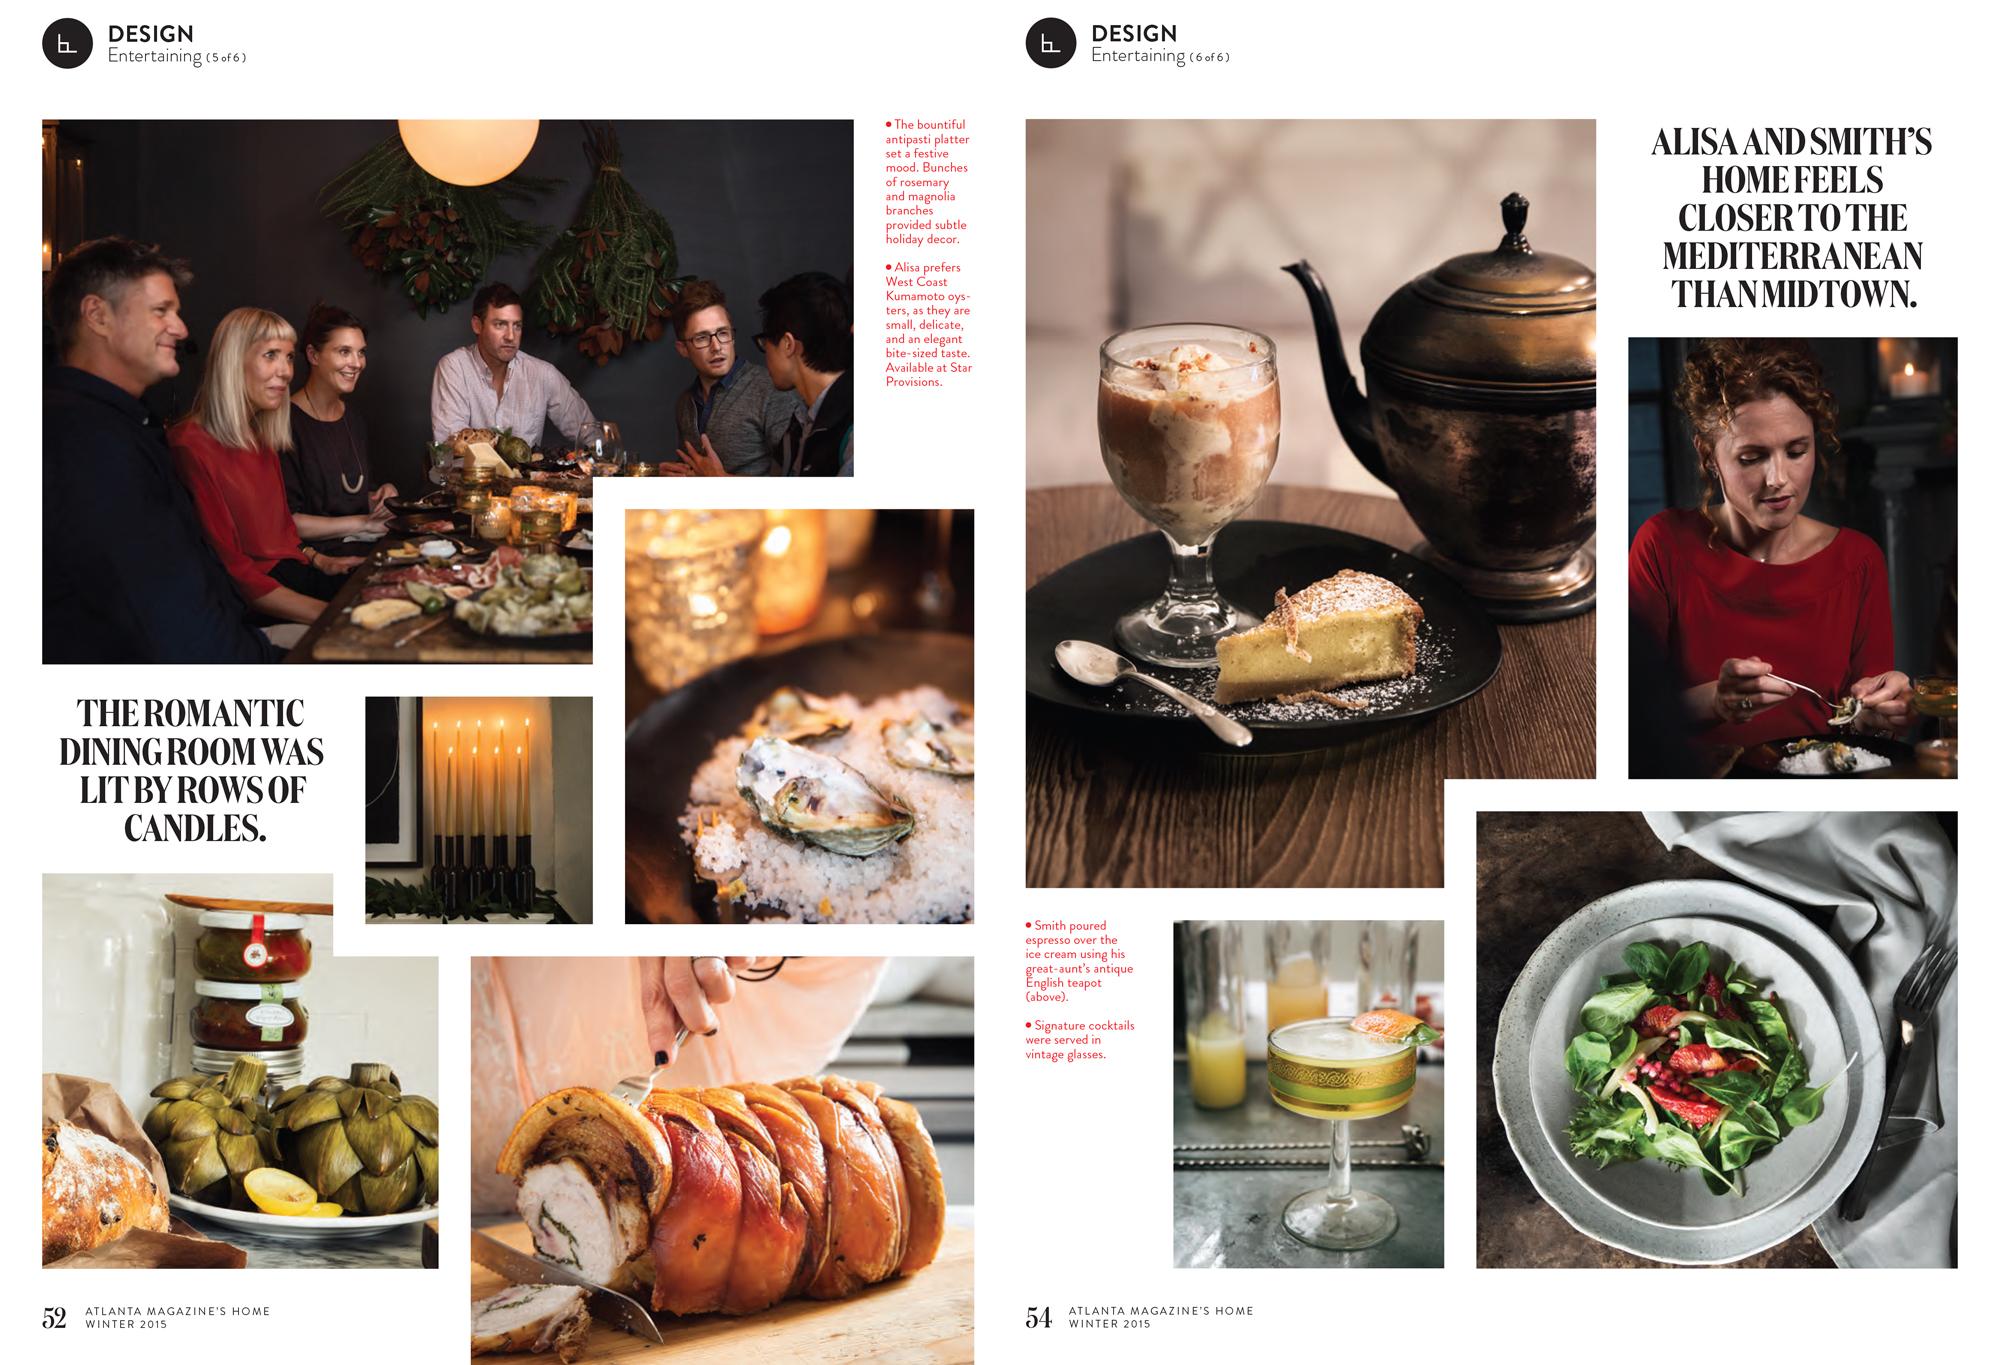 ATLANTA-MAGAZINE-HOMES---DINNER-PARTY-3.jpg